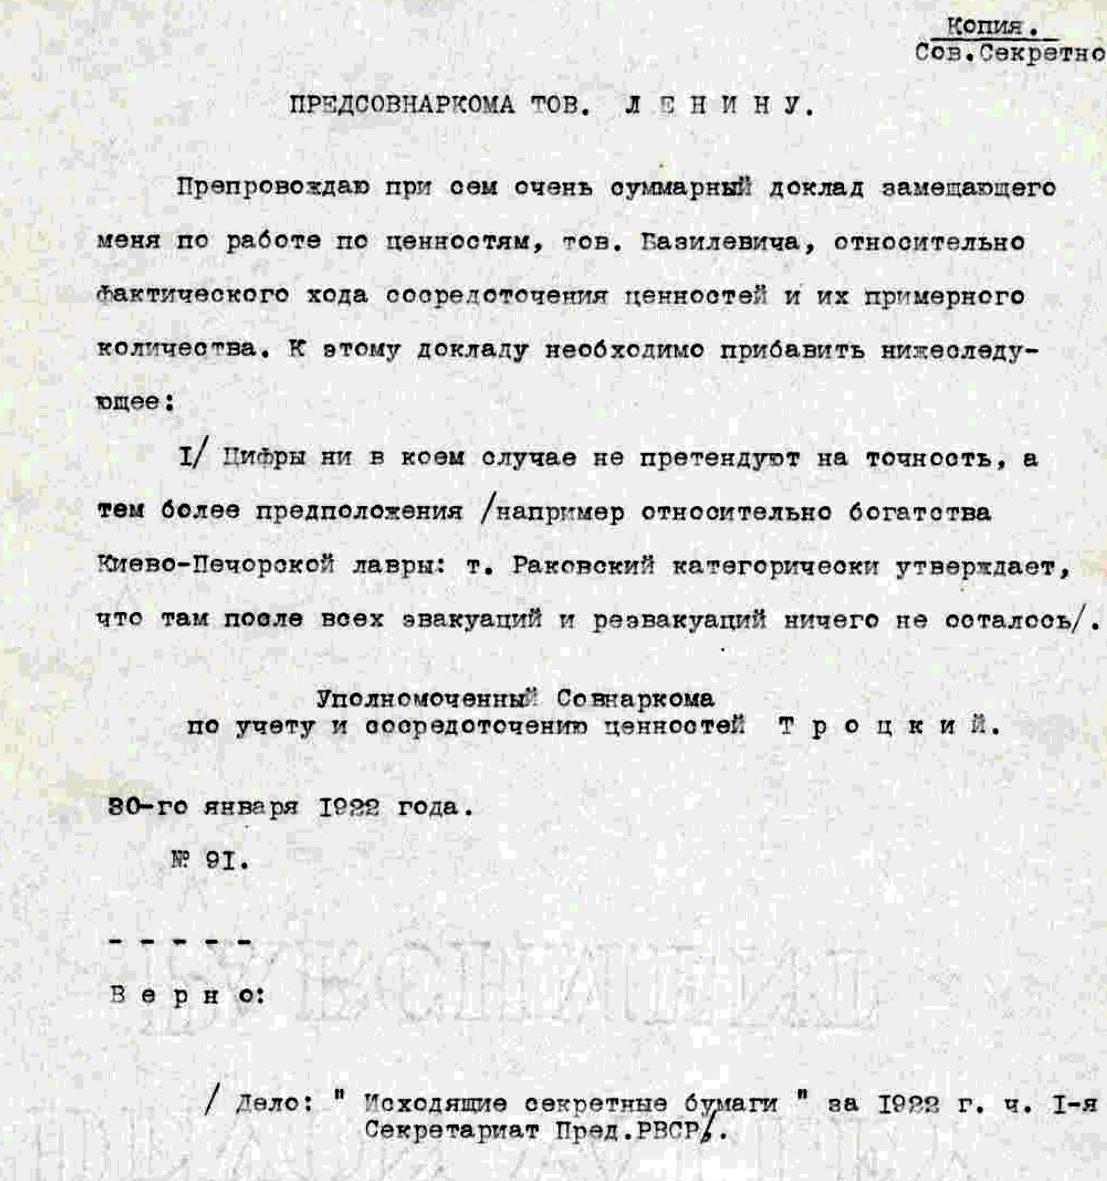 http://images.vfl.ru/ii/1545457666/c12e7b81/24688180.png